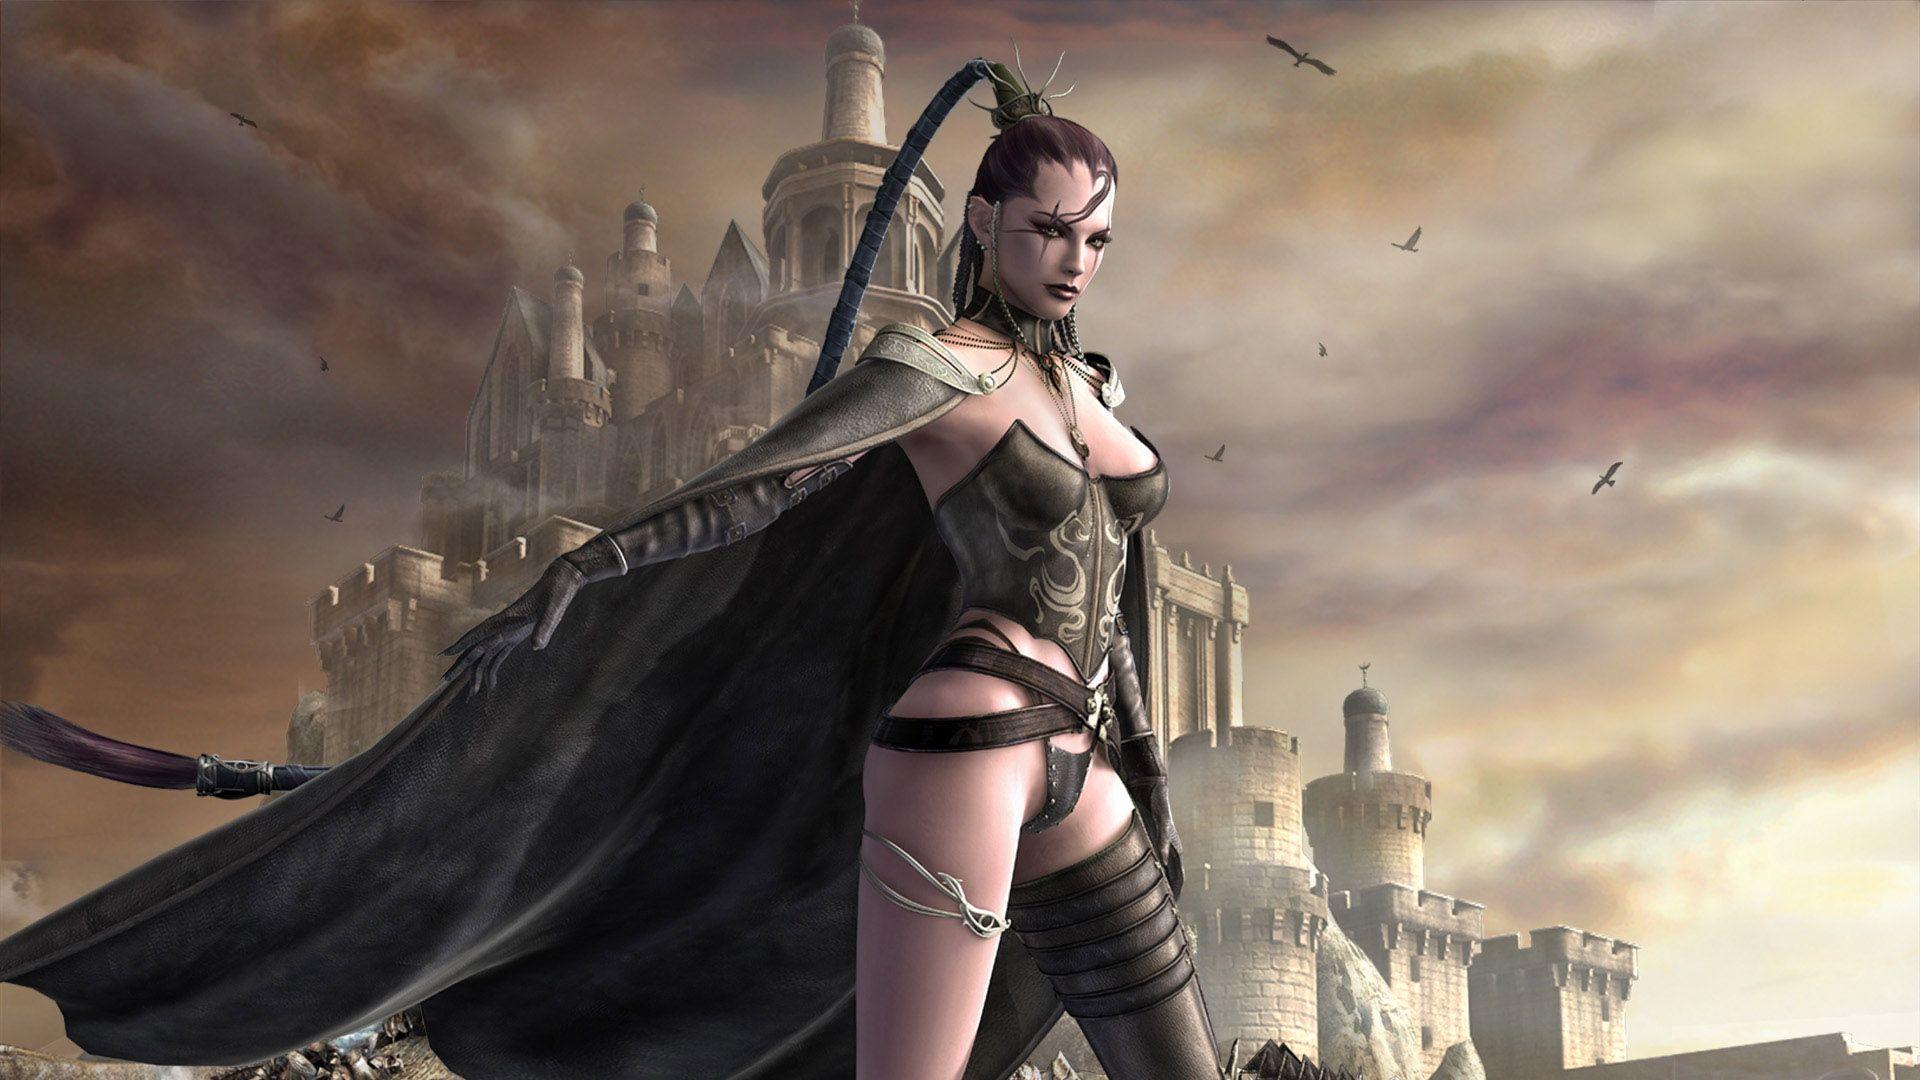 women warrior wallpaper for desktop background, 293 kB - Colden ...